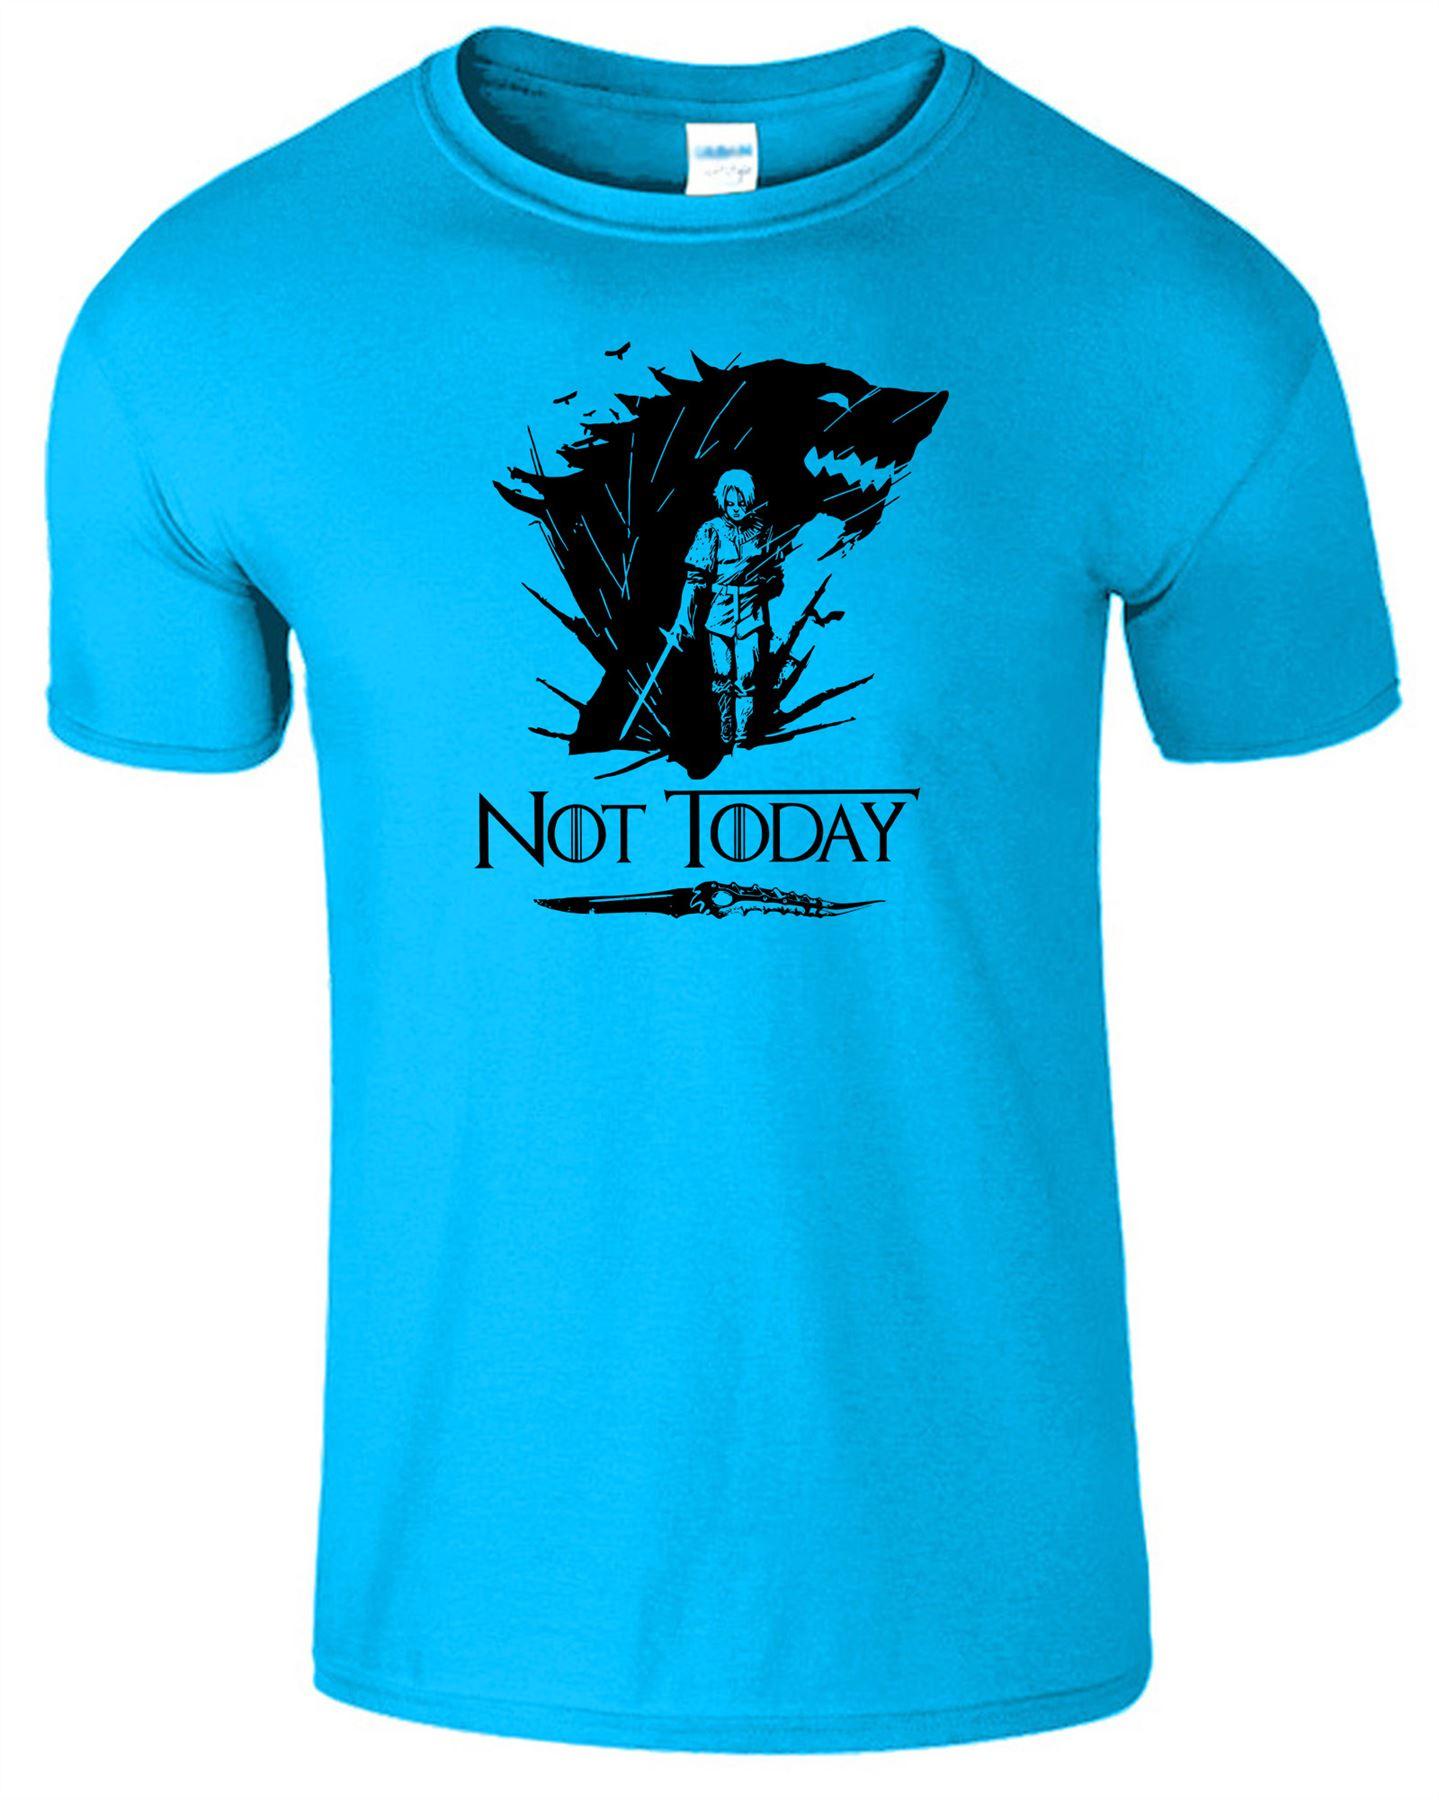 Arya-Stark-Not-Today-T-Shirt-Mens-Game-Season-Womens-Shirt-Adults-Unisex-Fit Indexbild 43